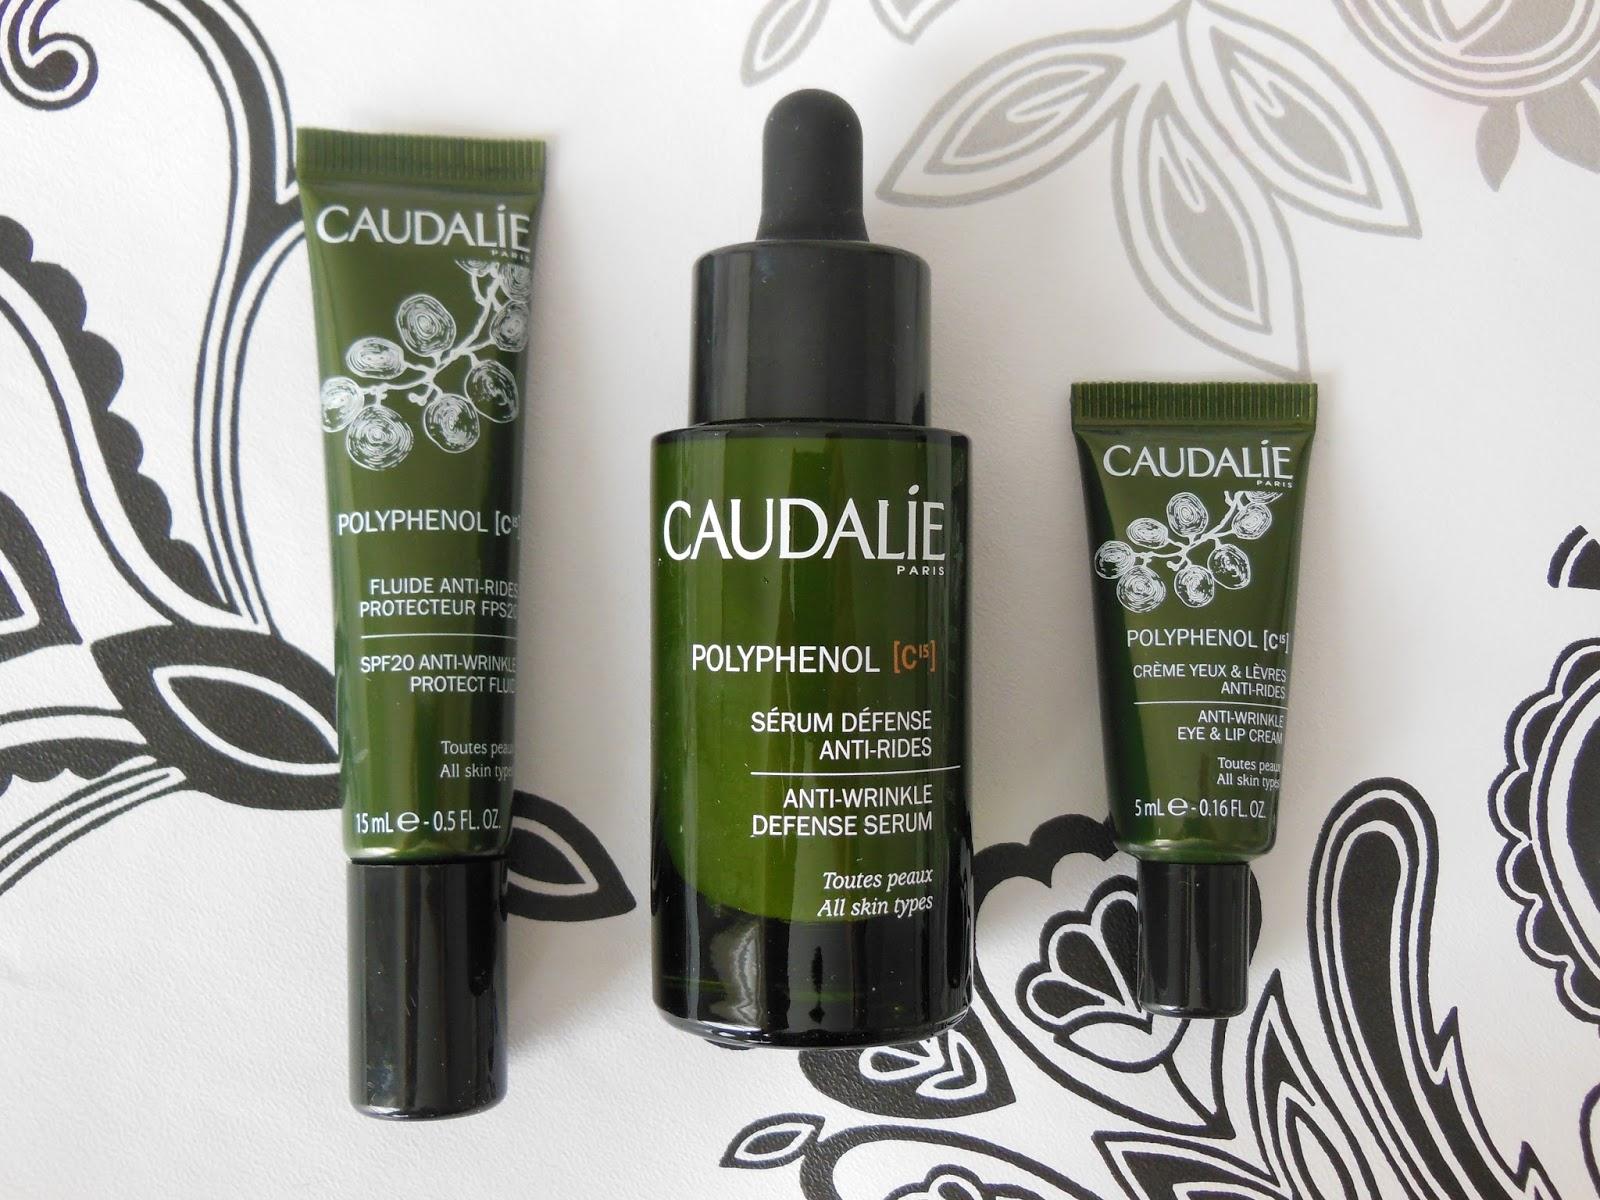 Caudalie Polyphenol C15 skincare range